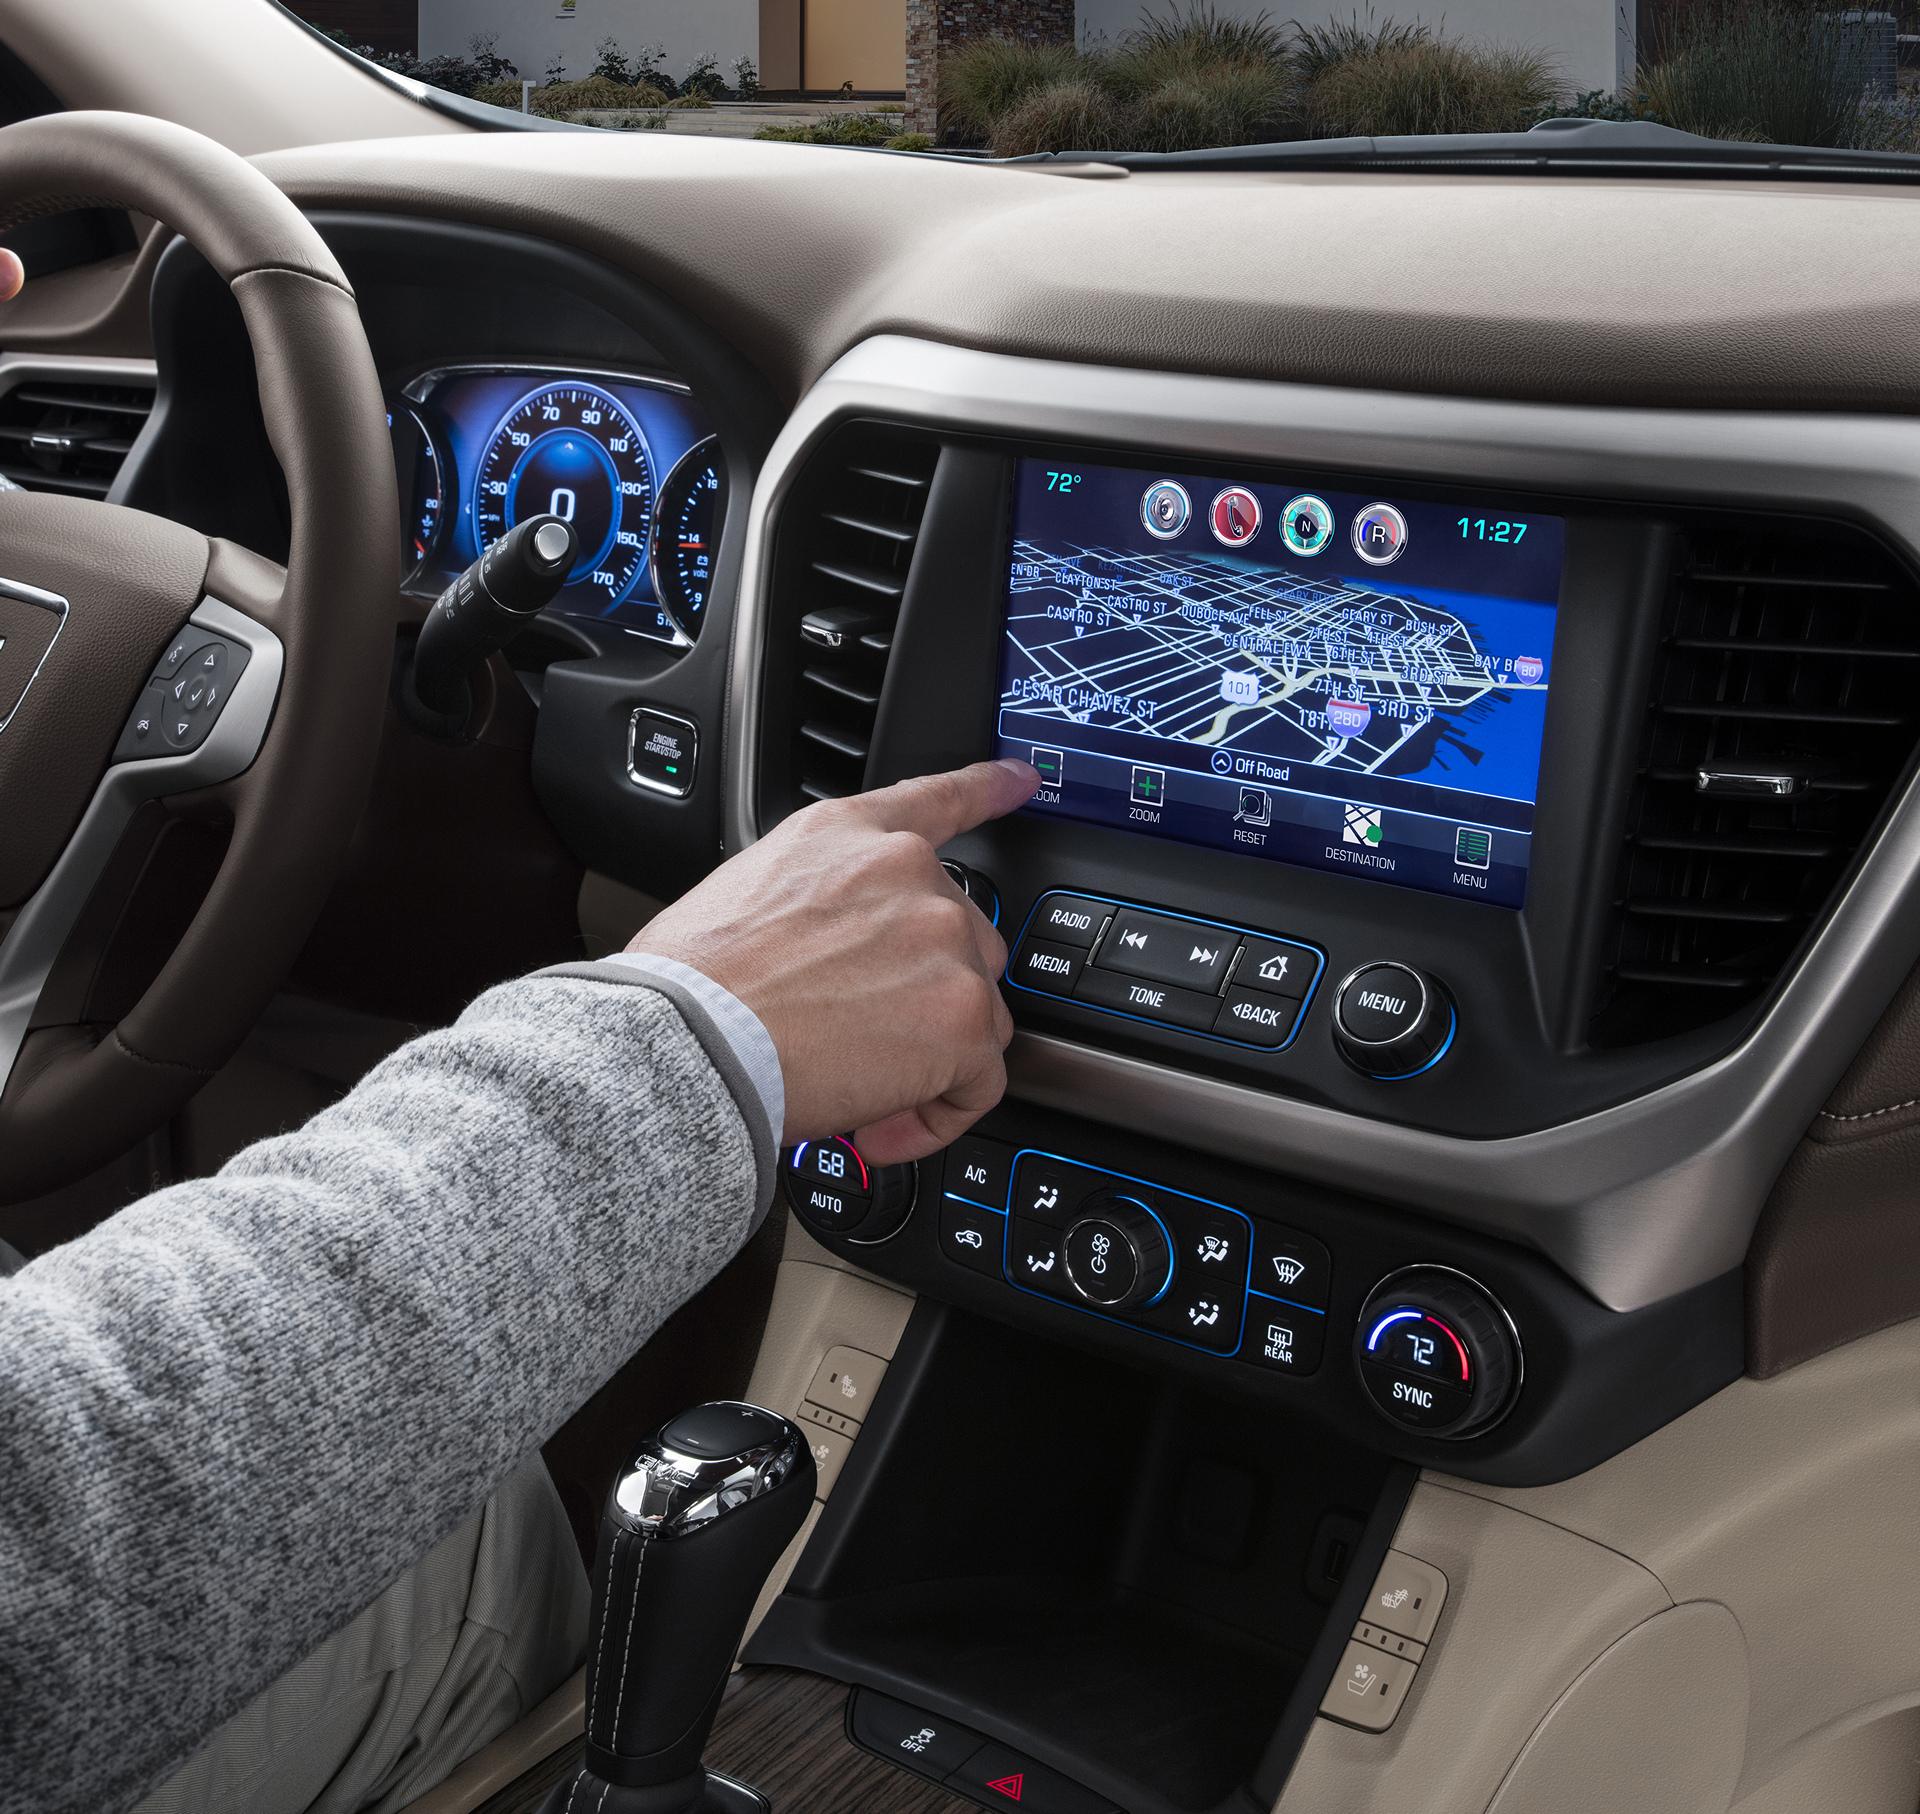 2017 Gmc Acadia Denali Infotainment C General Motors Carrrs Auto